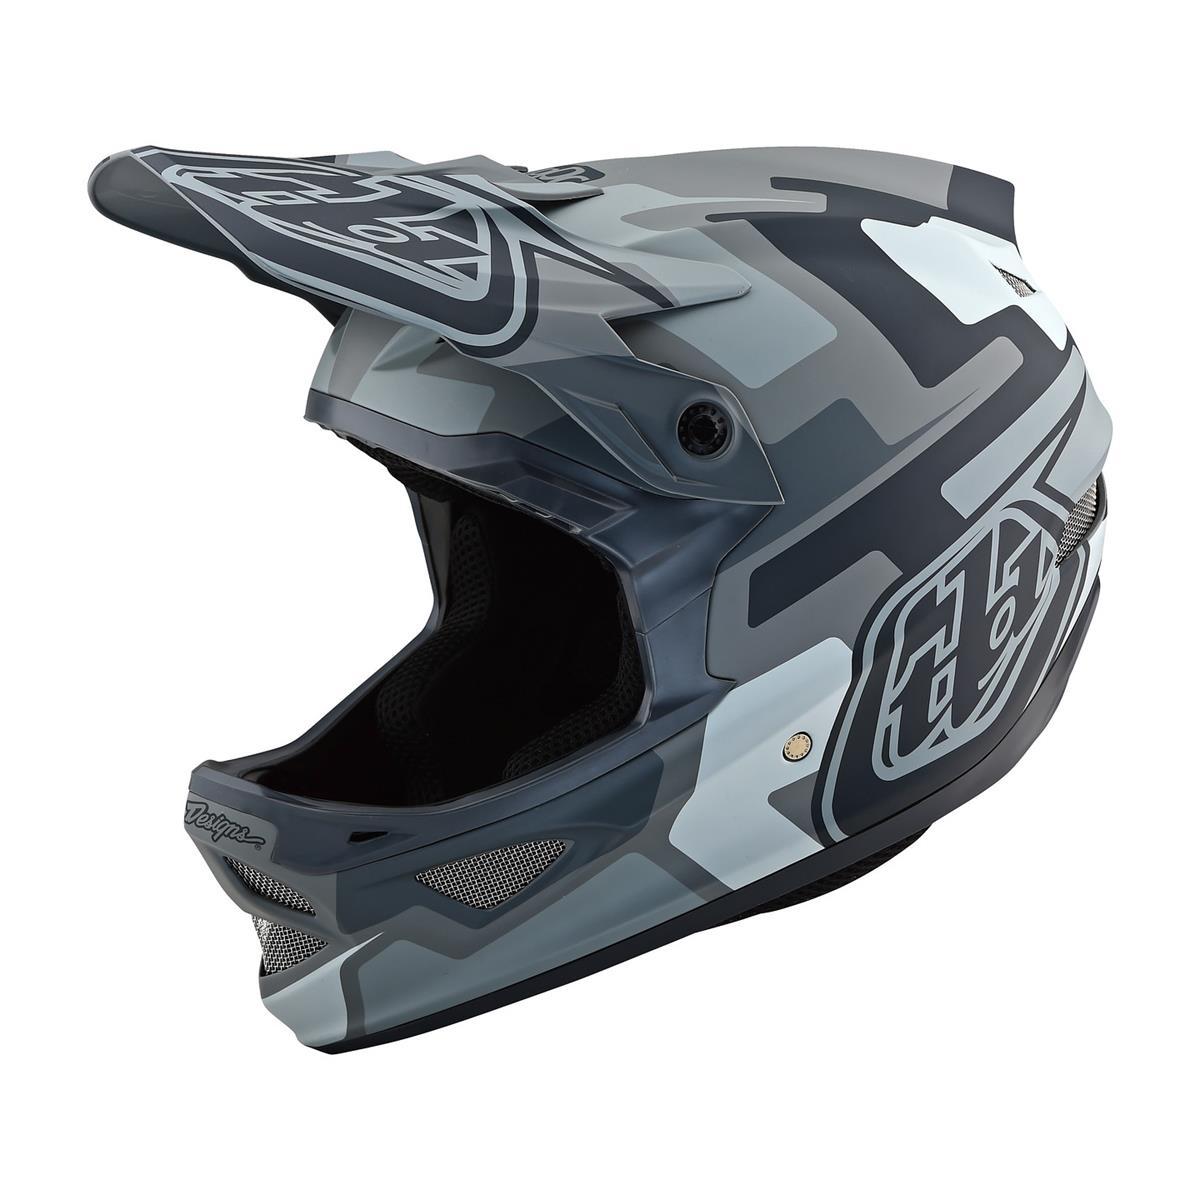 Troy Lee Designs Downhill-MTB-Helm D3 Fiberlite Speedcode - gris